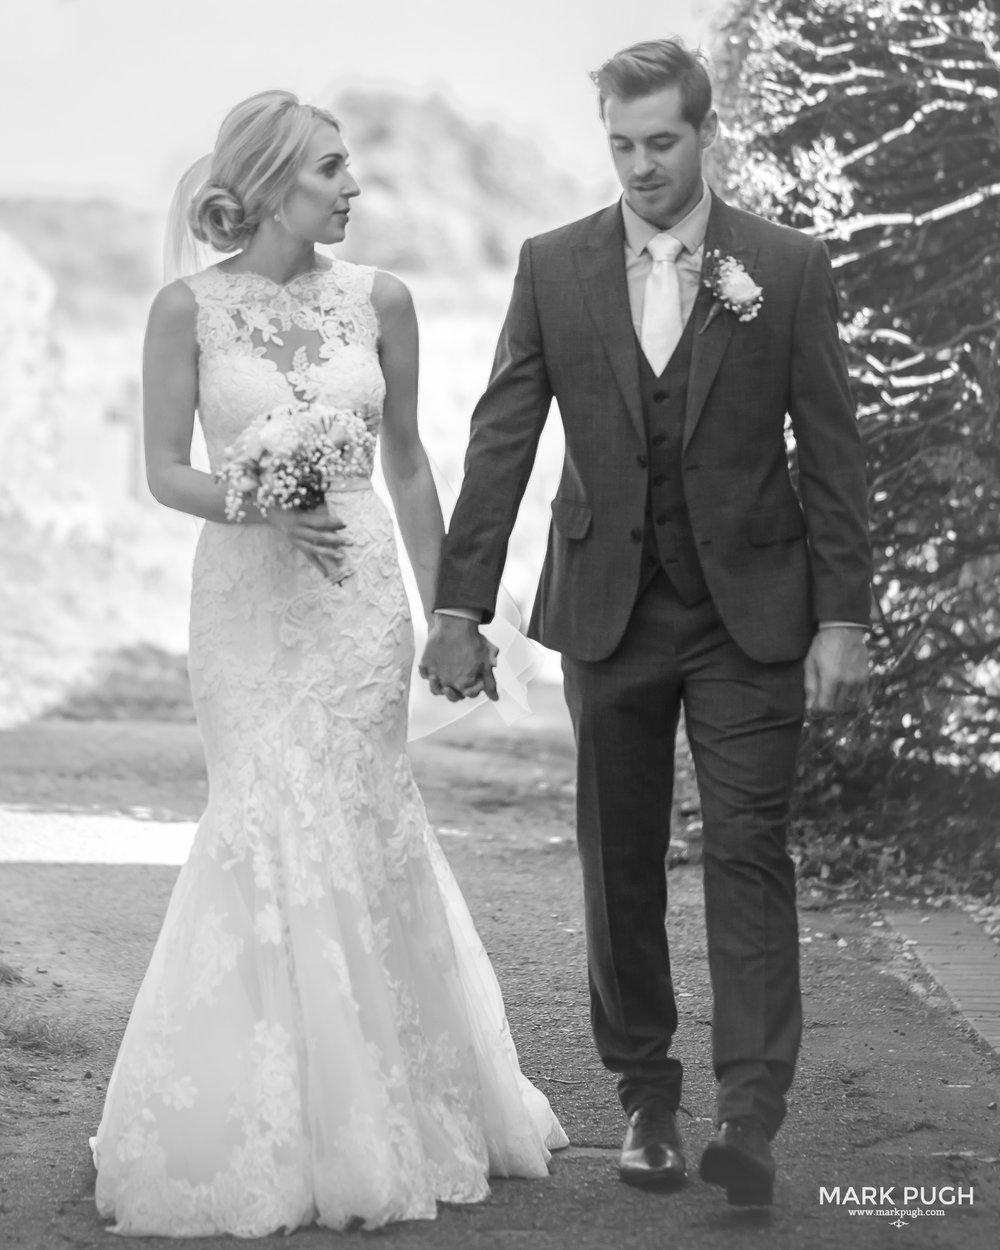 060 - Lucy and  Steven fineART wedding photography by www.markpugh.com Mark Pugh of www.mpmedia.co.uk_.JPG